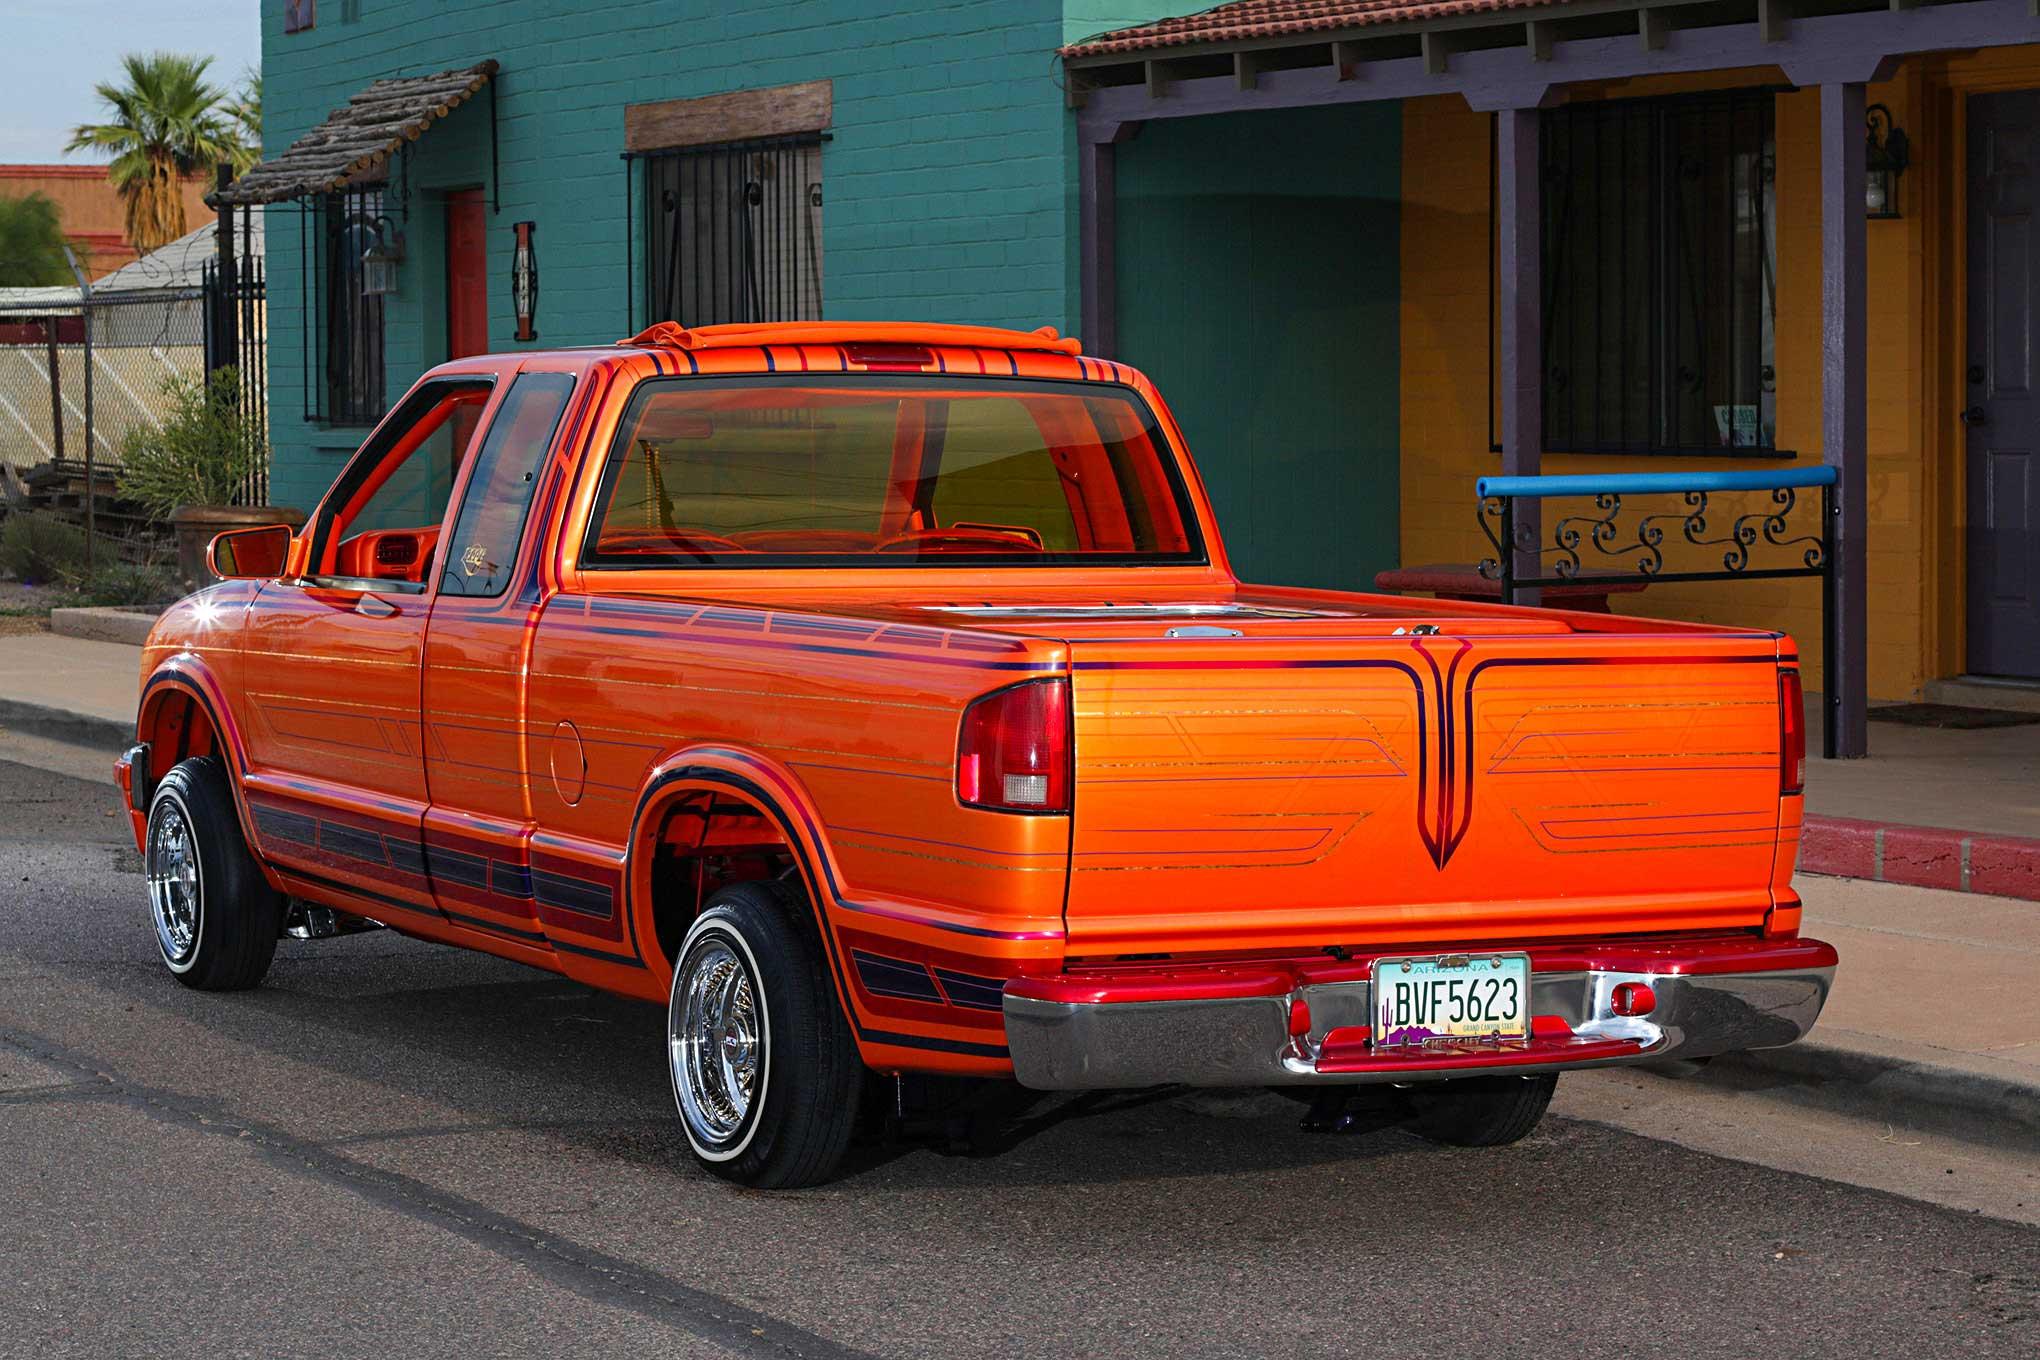 Thomas Padilla's Fancy 1998 Chevrolet S-10 Truck